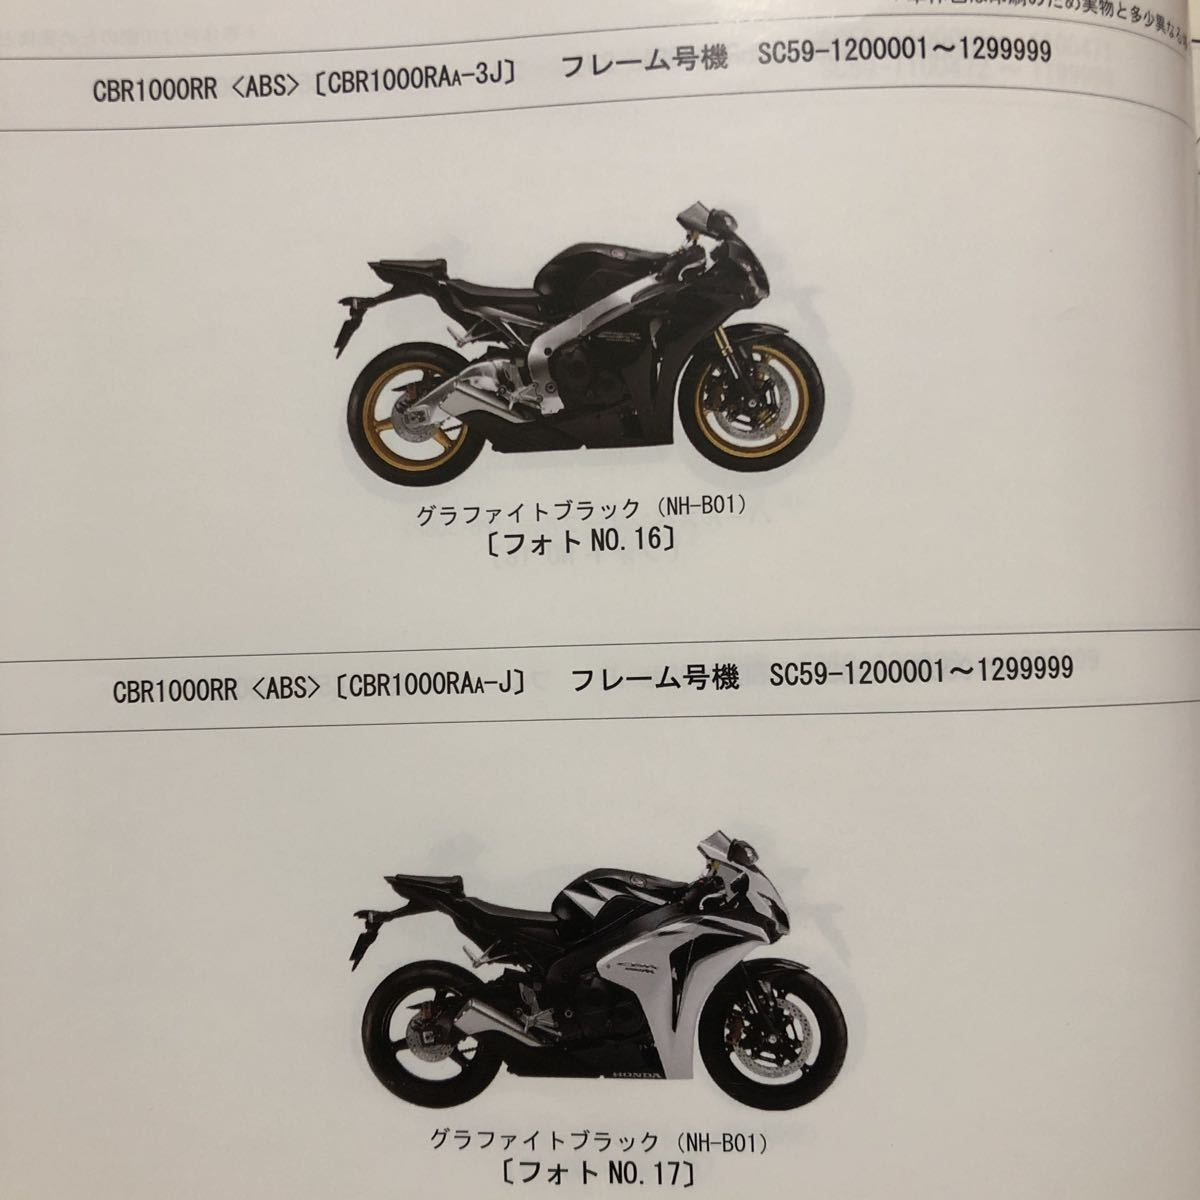 CBR1000RR SC59 パーツカタログ 即決価格で送料無料です_画像5